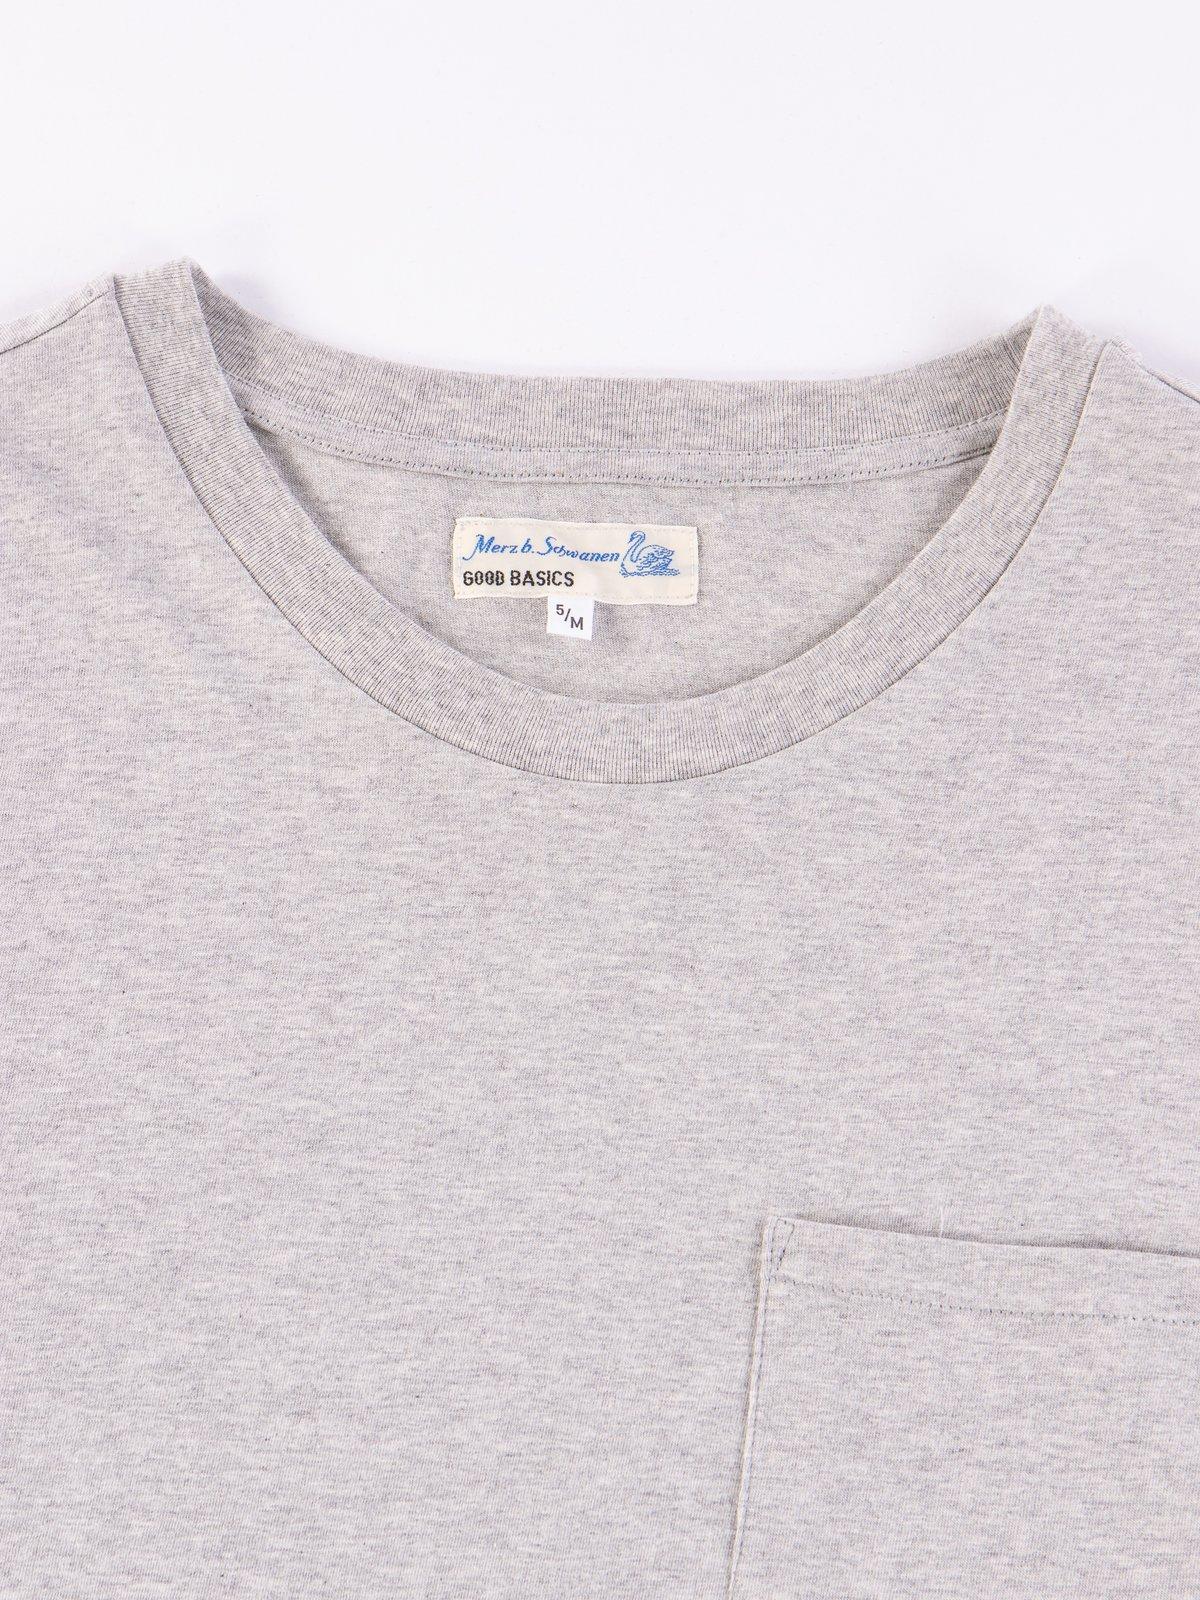 Grey Melange Good Basics CTP01 Pocket Crew Neck Tee - Image 3